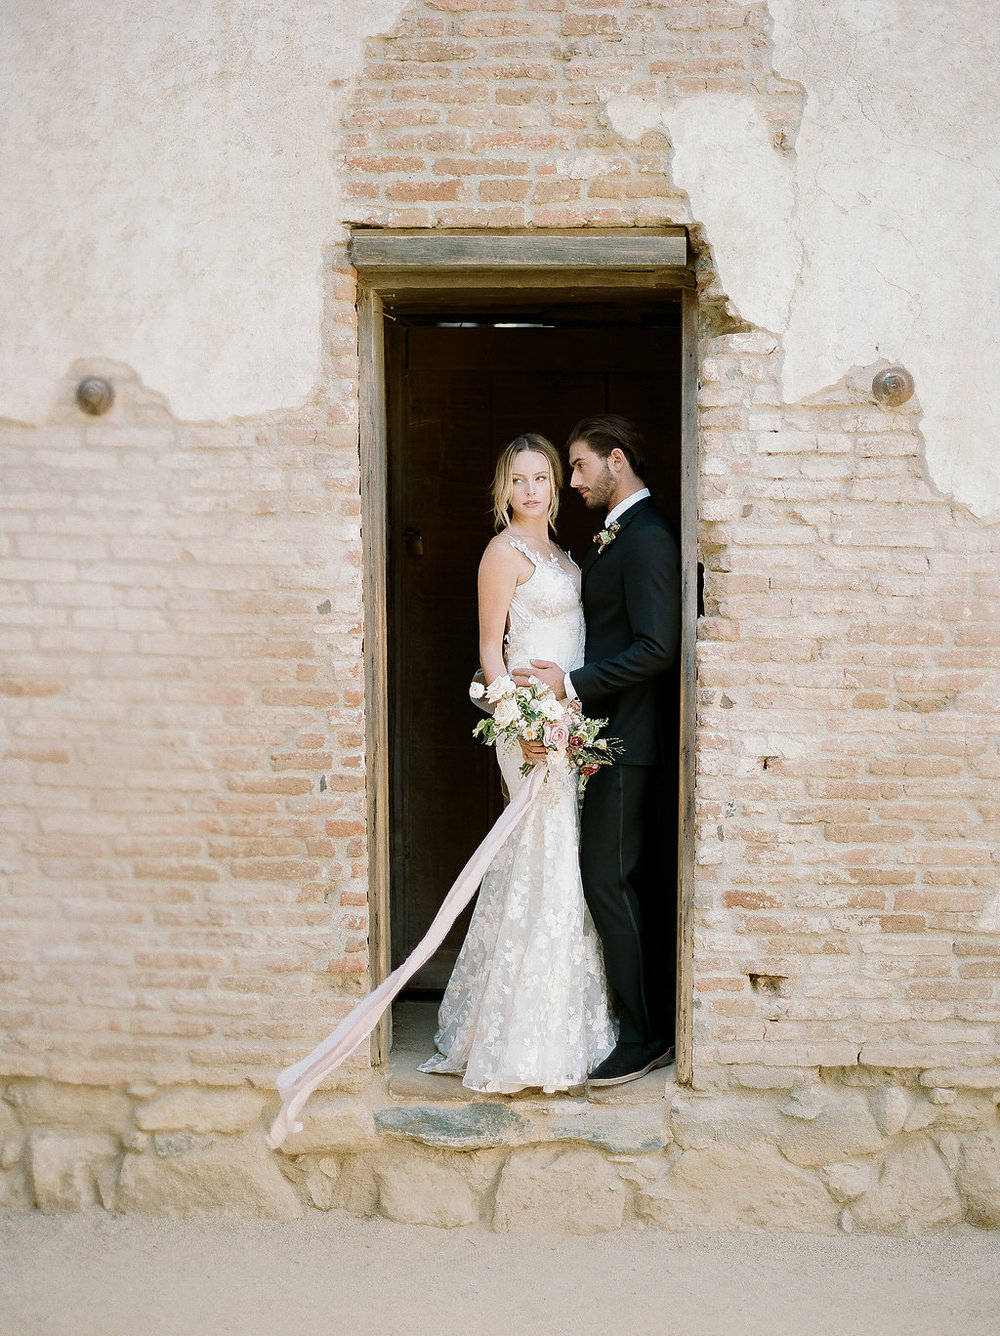 Spanish Mission Style Wedding Ideas Bridal Bouquet Summer Flowers Finding Flora Wedding Sparrow Fine Art Bride and Groom